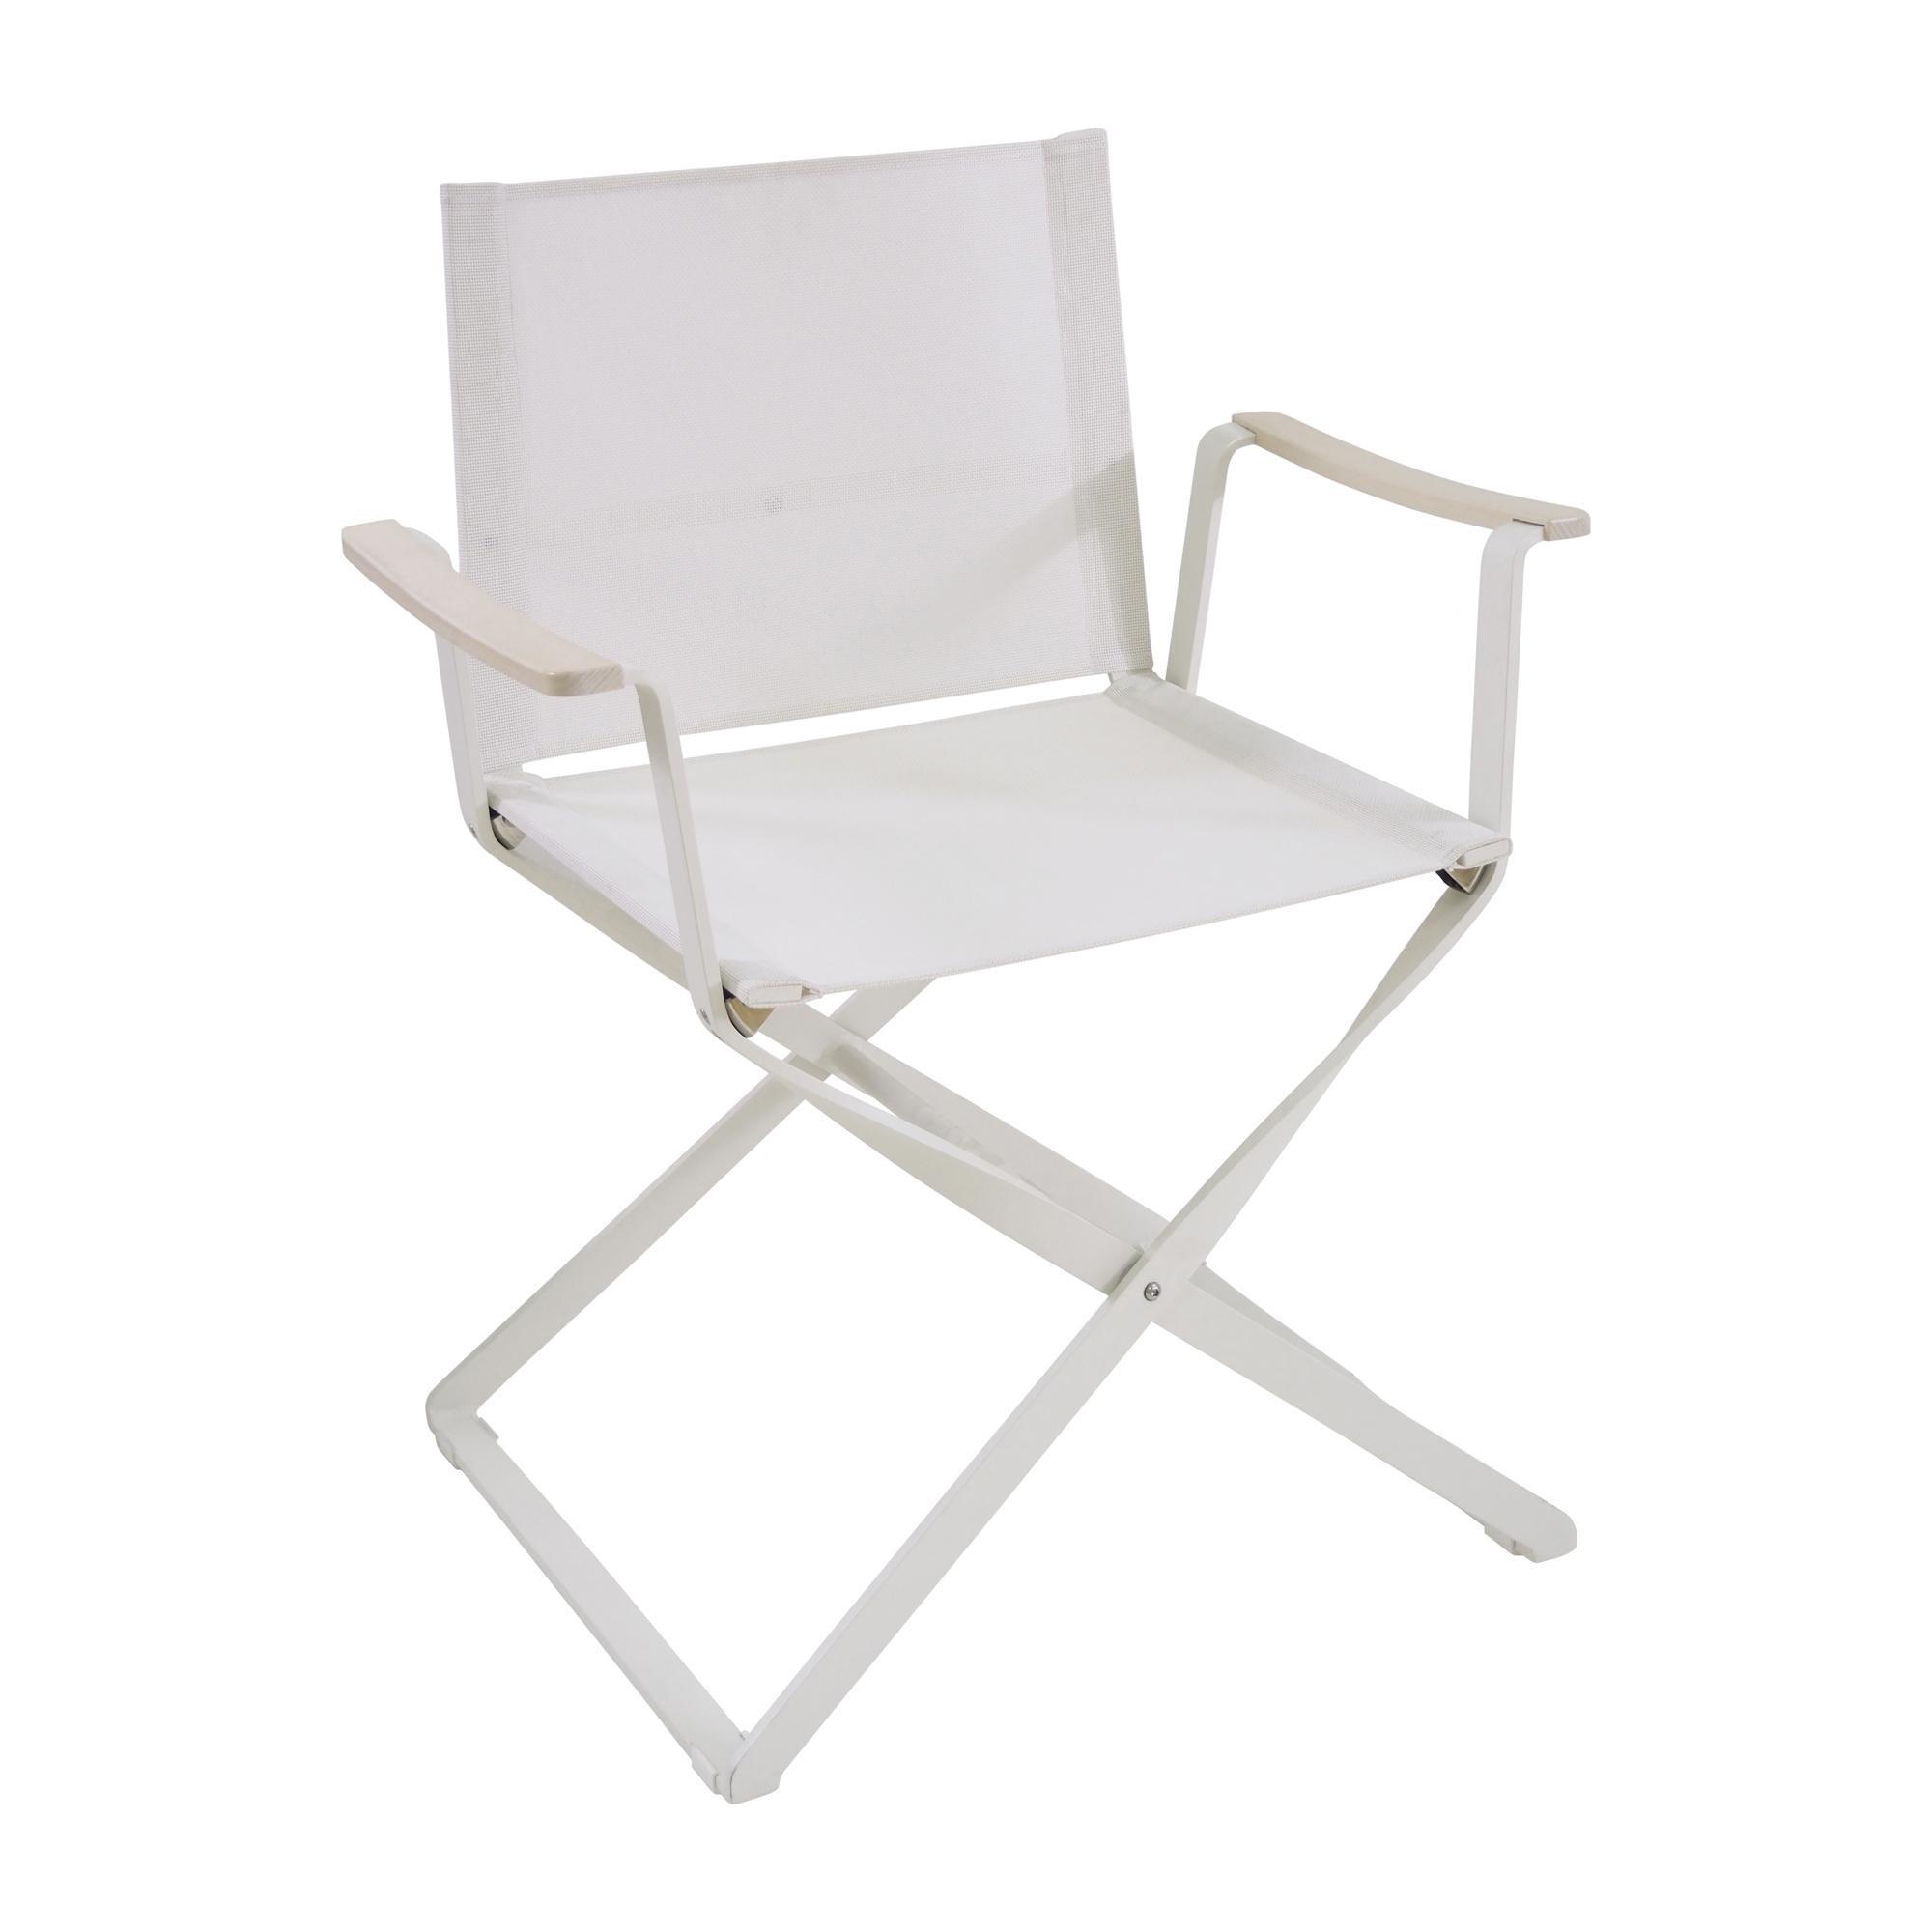 directors chair white cheap lawn chairs emu ciak director s ambientedirect rough seating tex